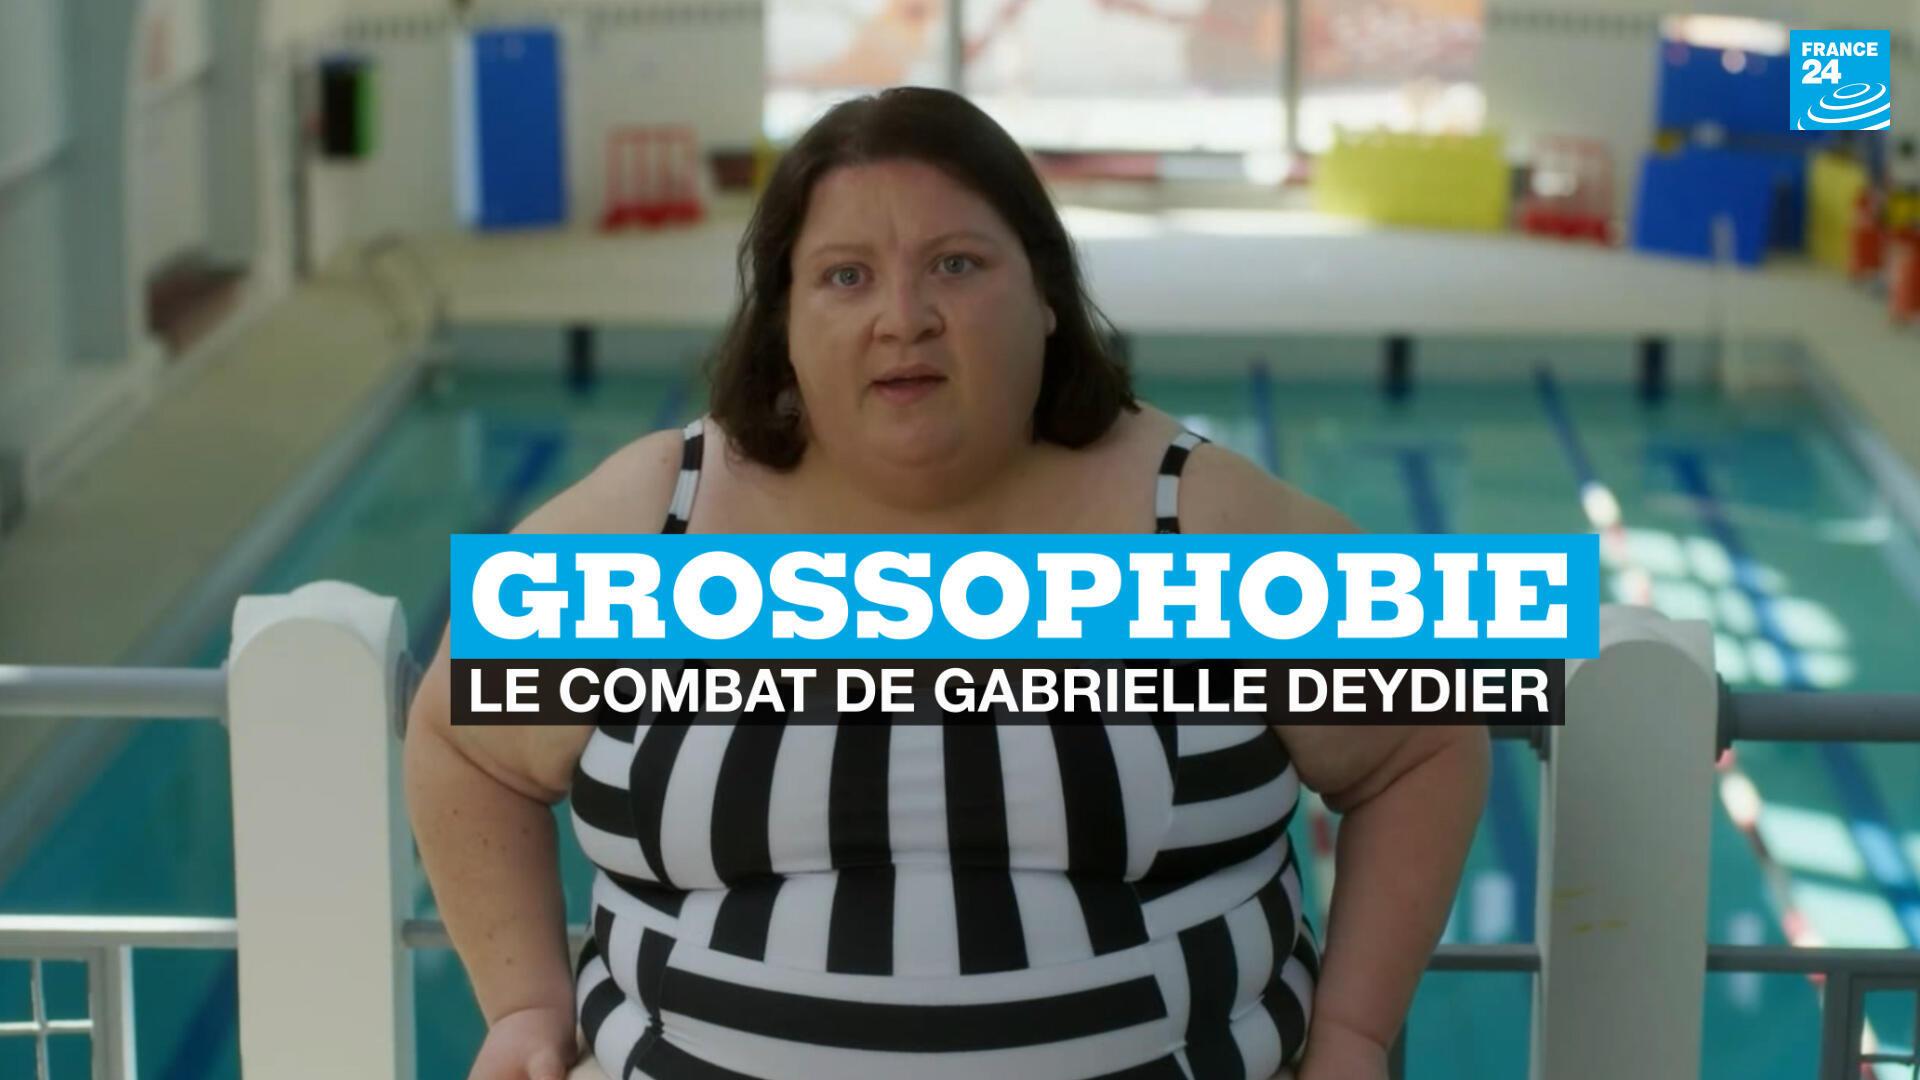 Grossophobie Gabrielle Deydier.00_00_11_07.Image fixe001